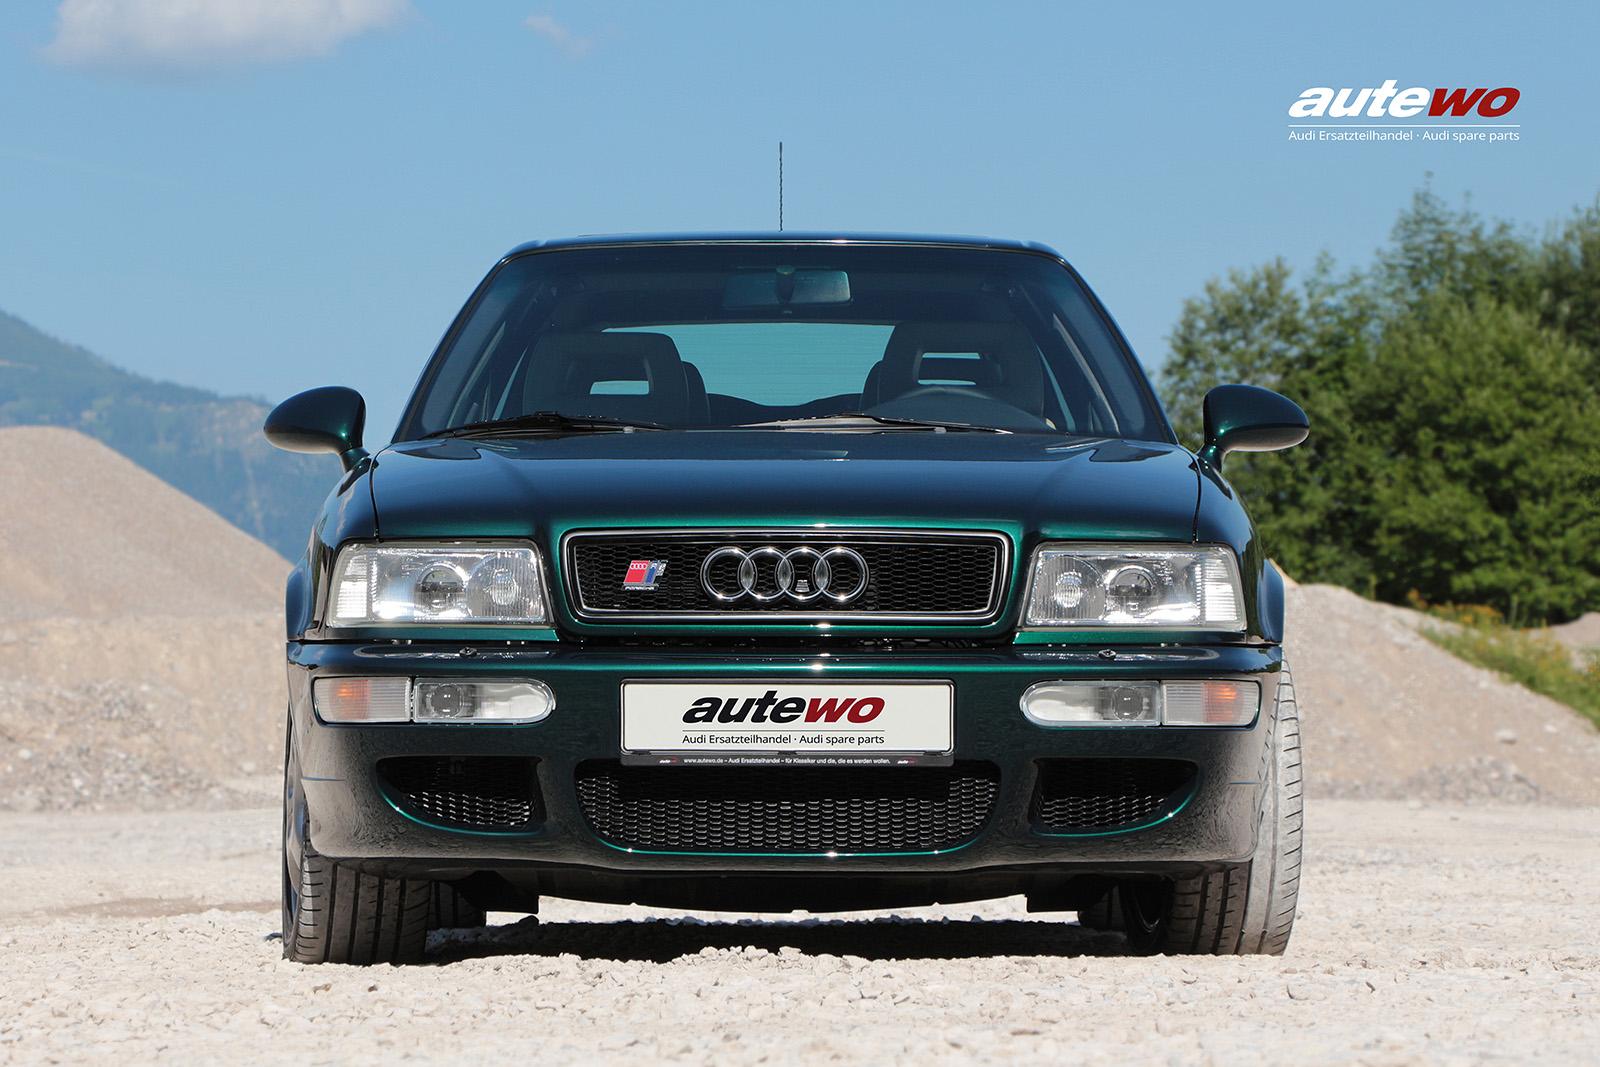 Leinwand-Druck Motiv Audi/Porsche RS2 P1 Holzkeilrahmen 40x60cm